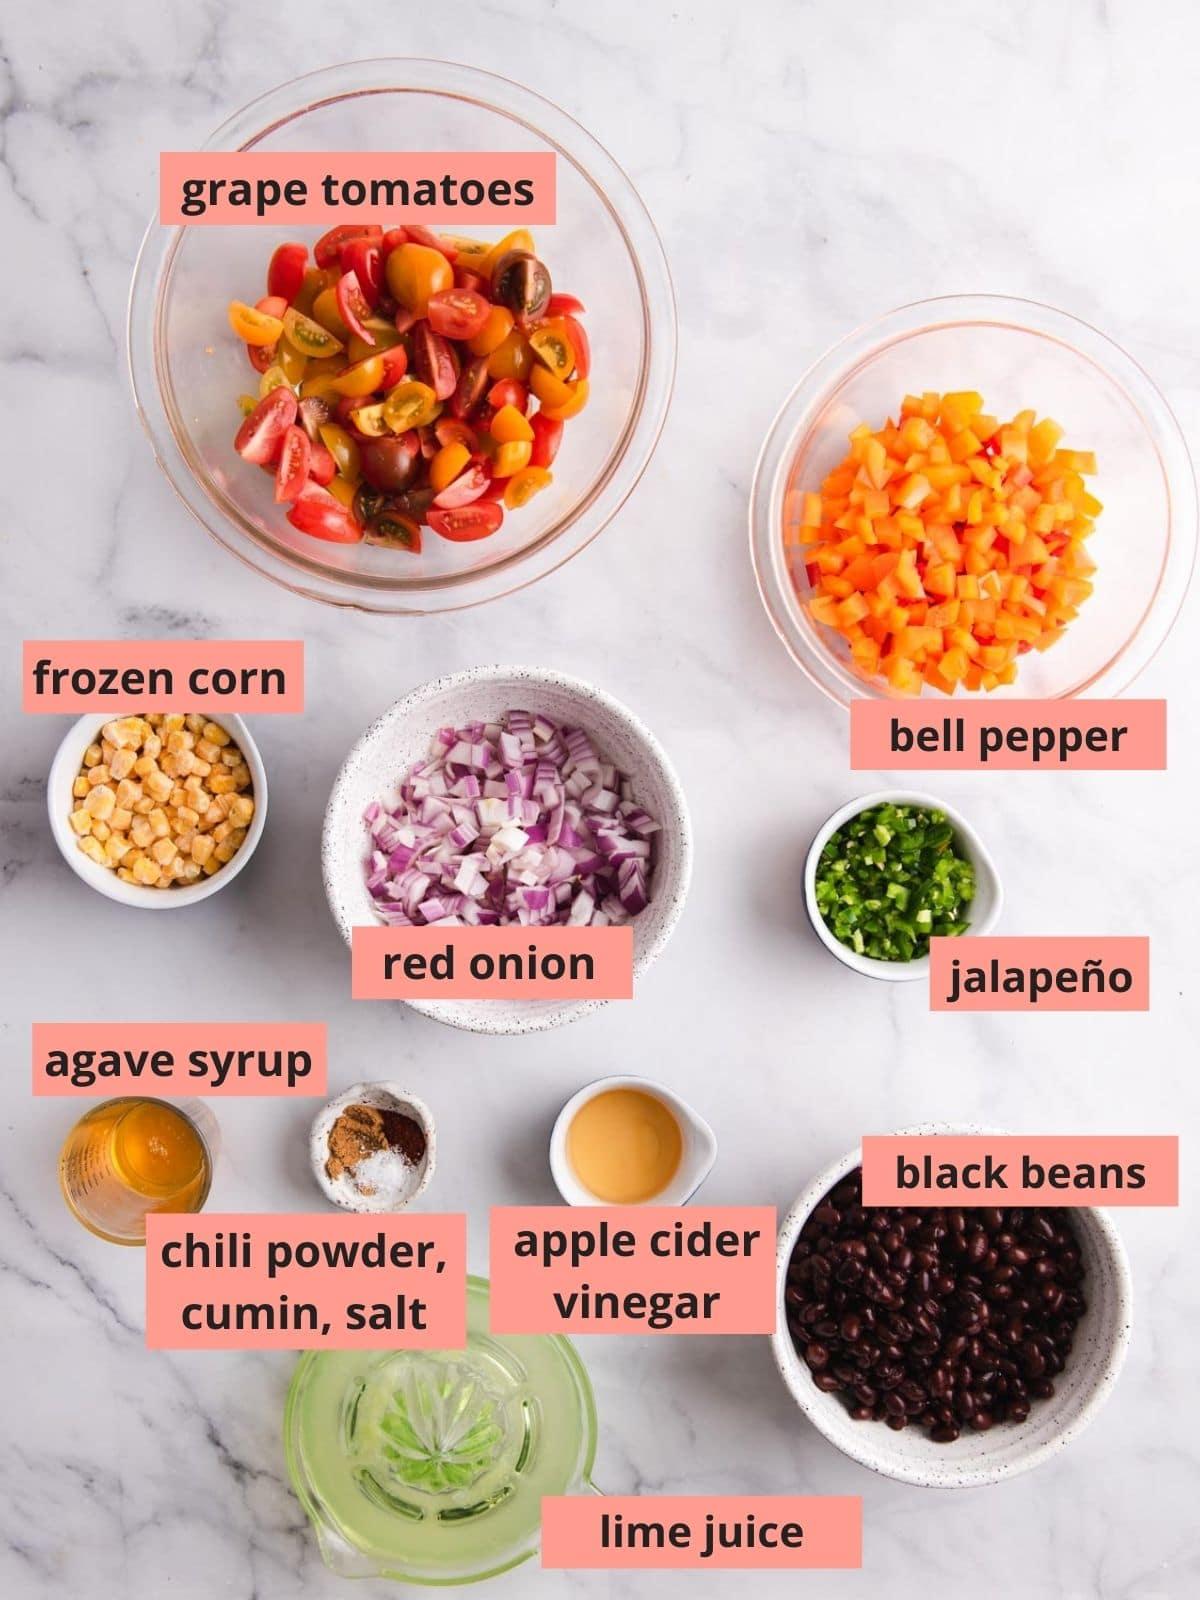 Labeled ingredients used to make black bean salsa